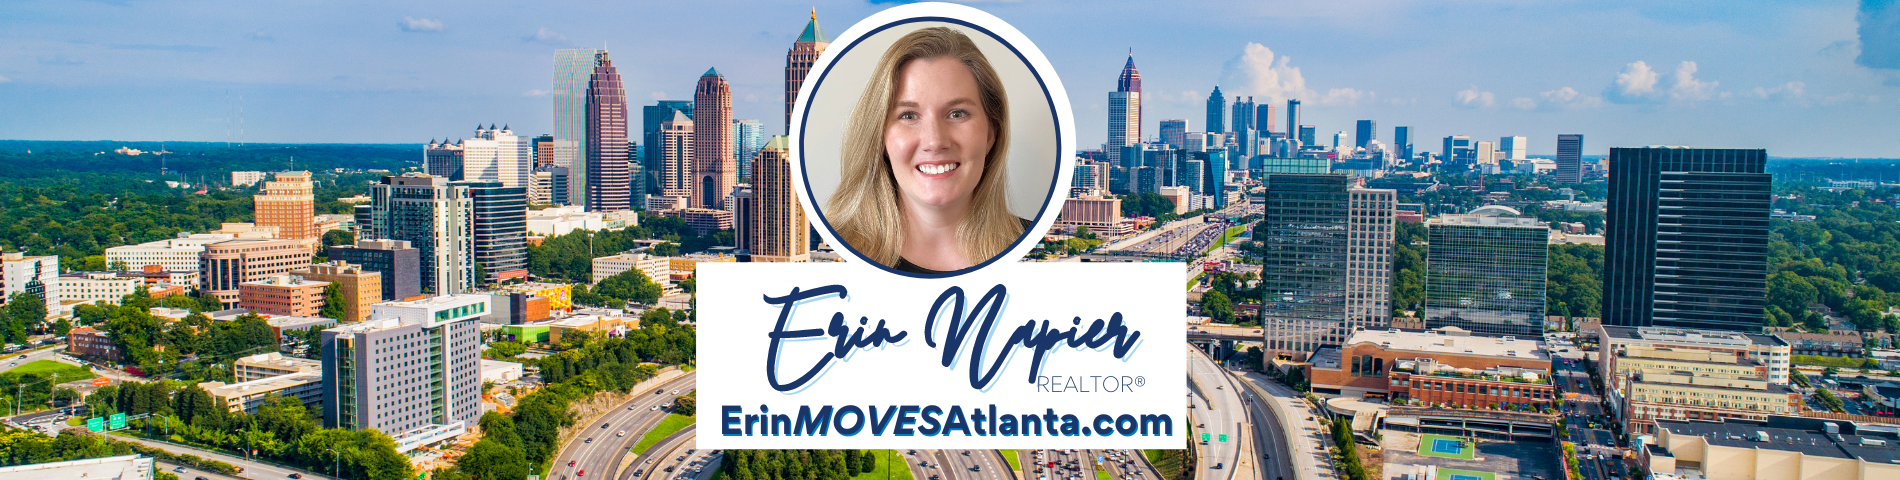 Erin Napier - Erin Moves Atlanta - RE/MAX Around Atlanta